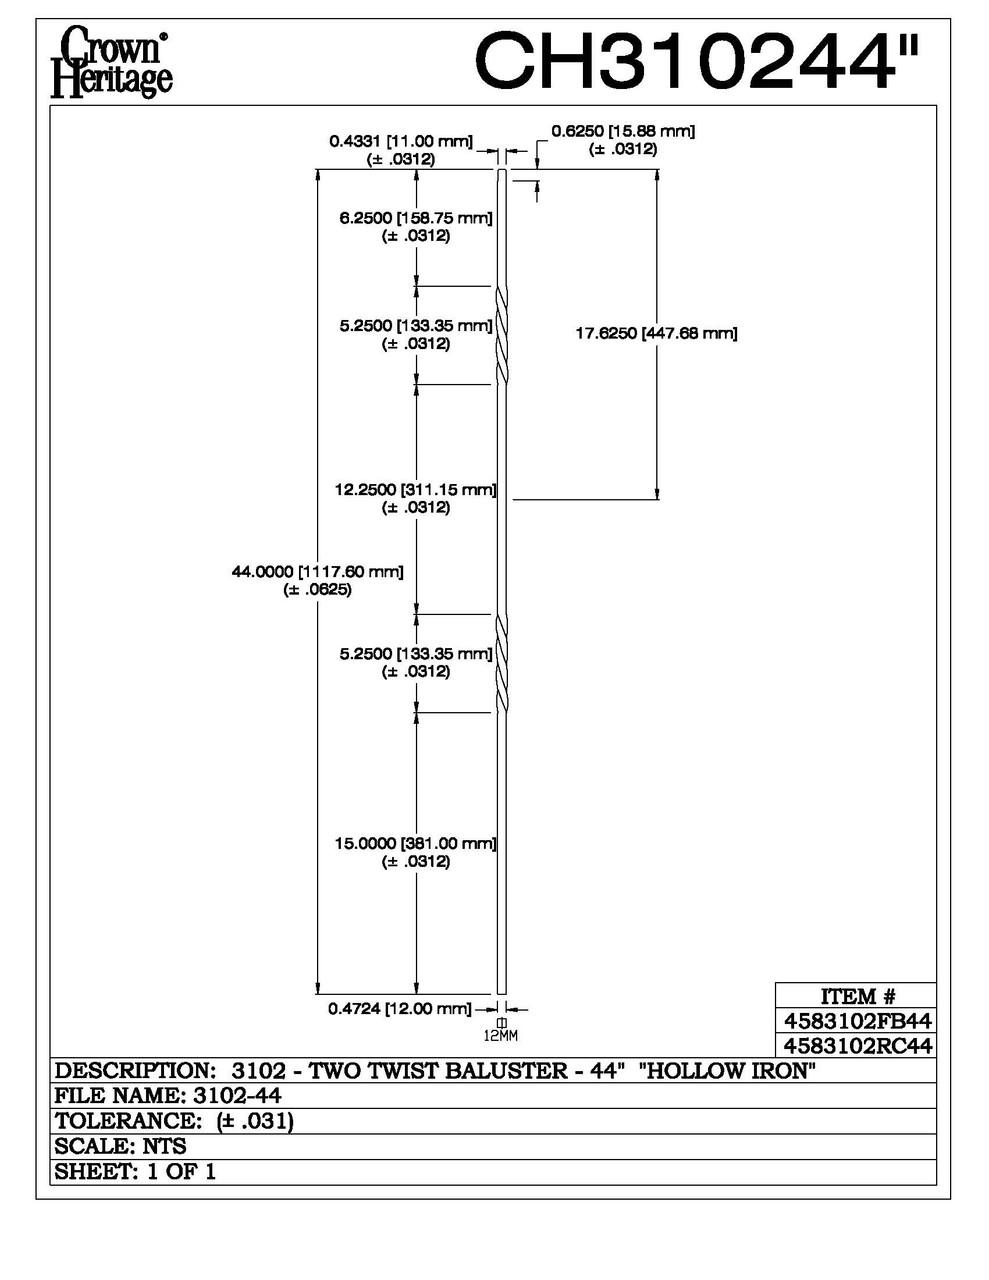 "3102-44 44"" Tubular Steel Double Twist Baluster, CADD DRAWING"